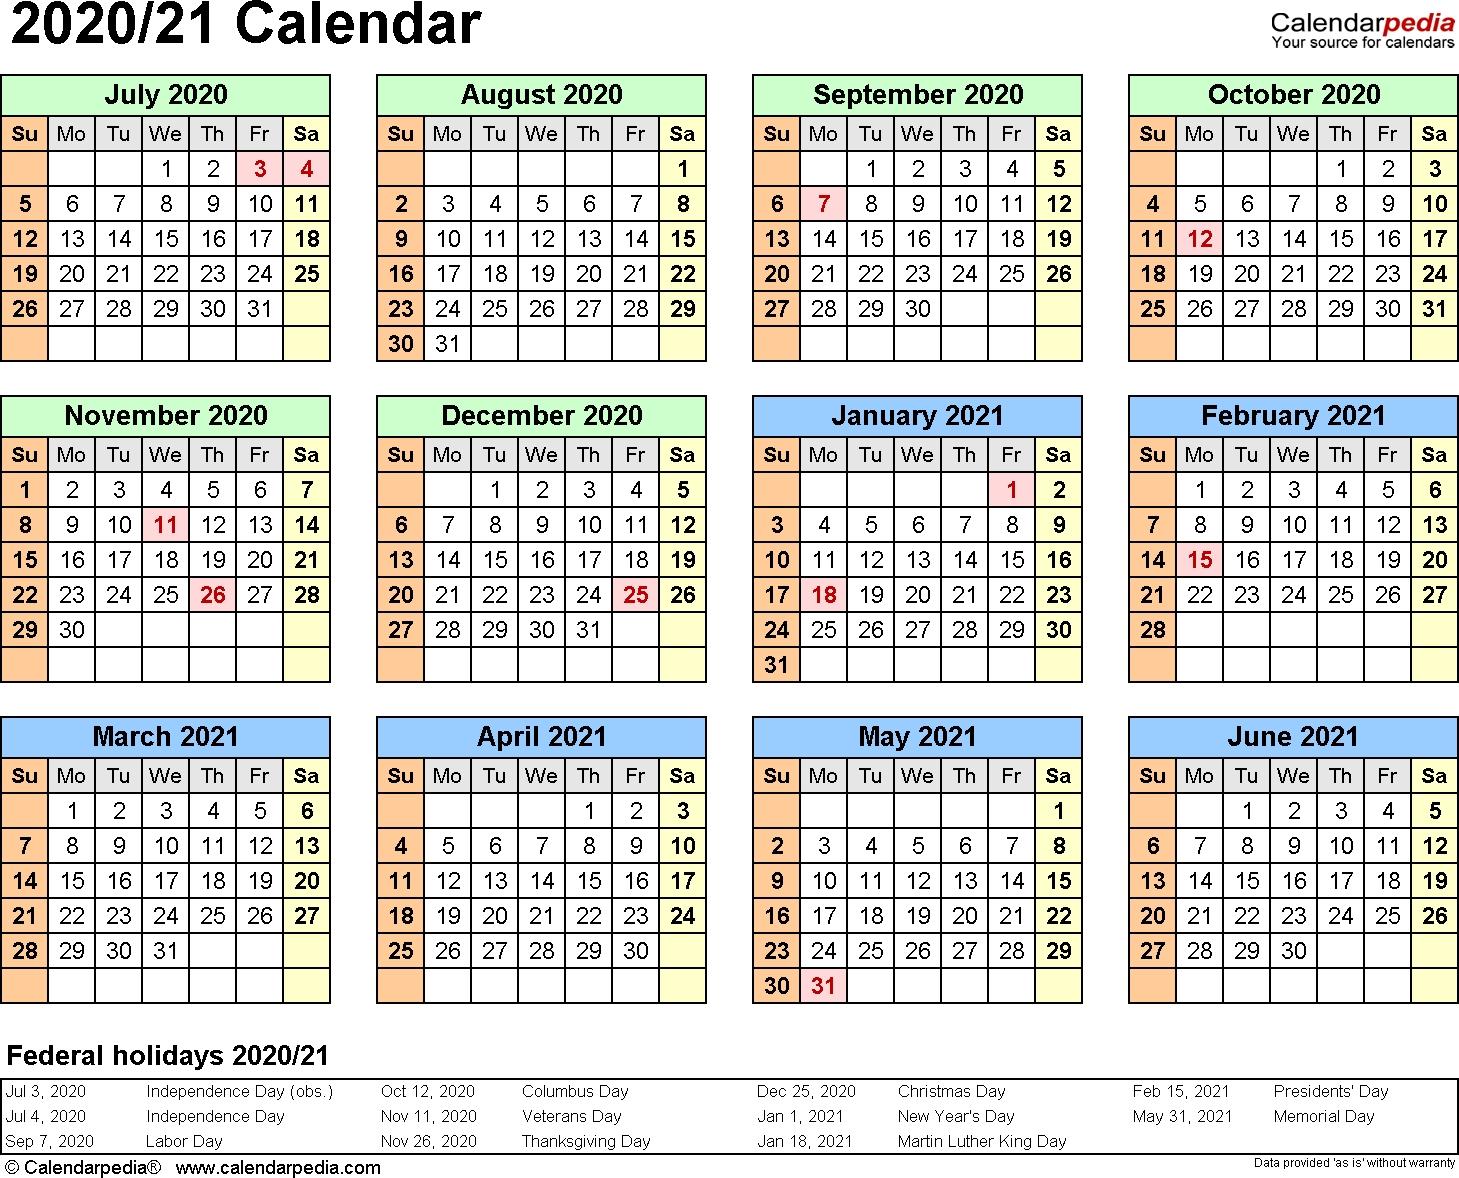 Split Year Calendar 2020/21 (July To June) - Word Templates in June 2019-June 2020 Yearly Calendar